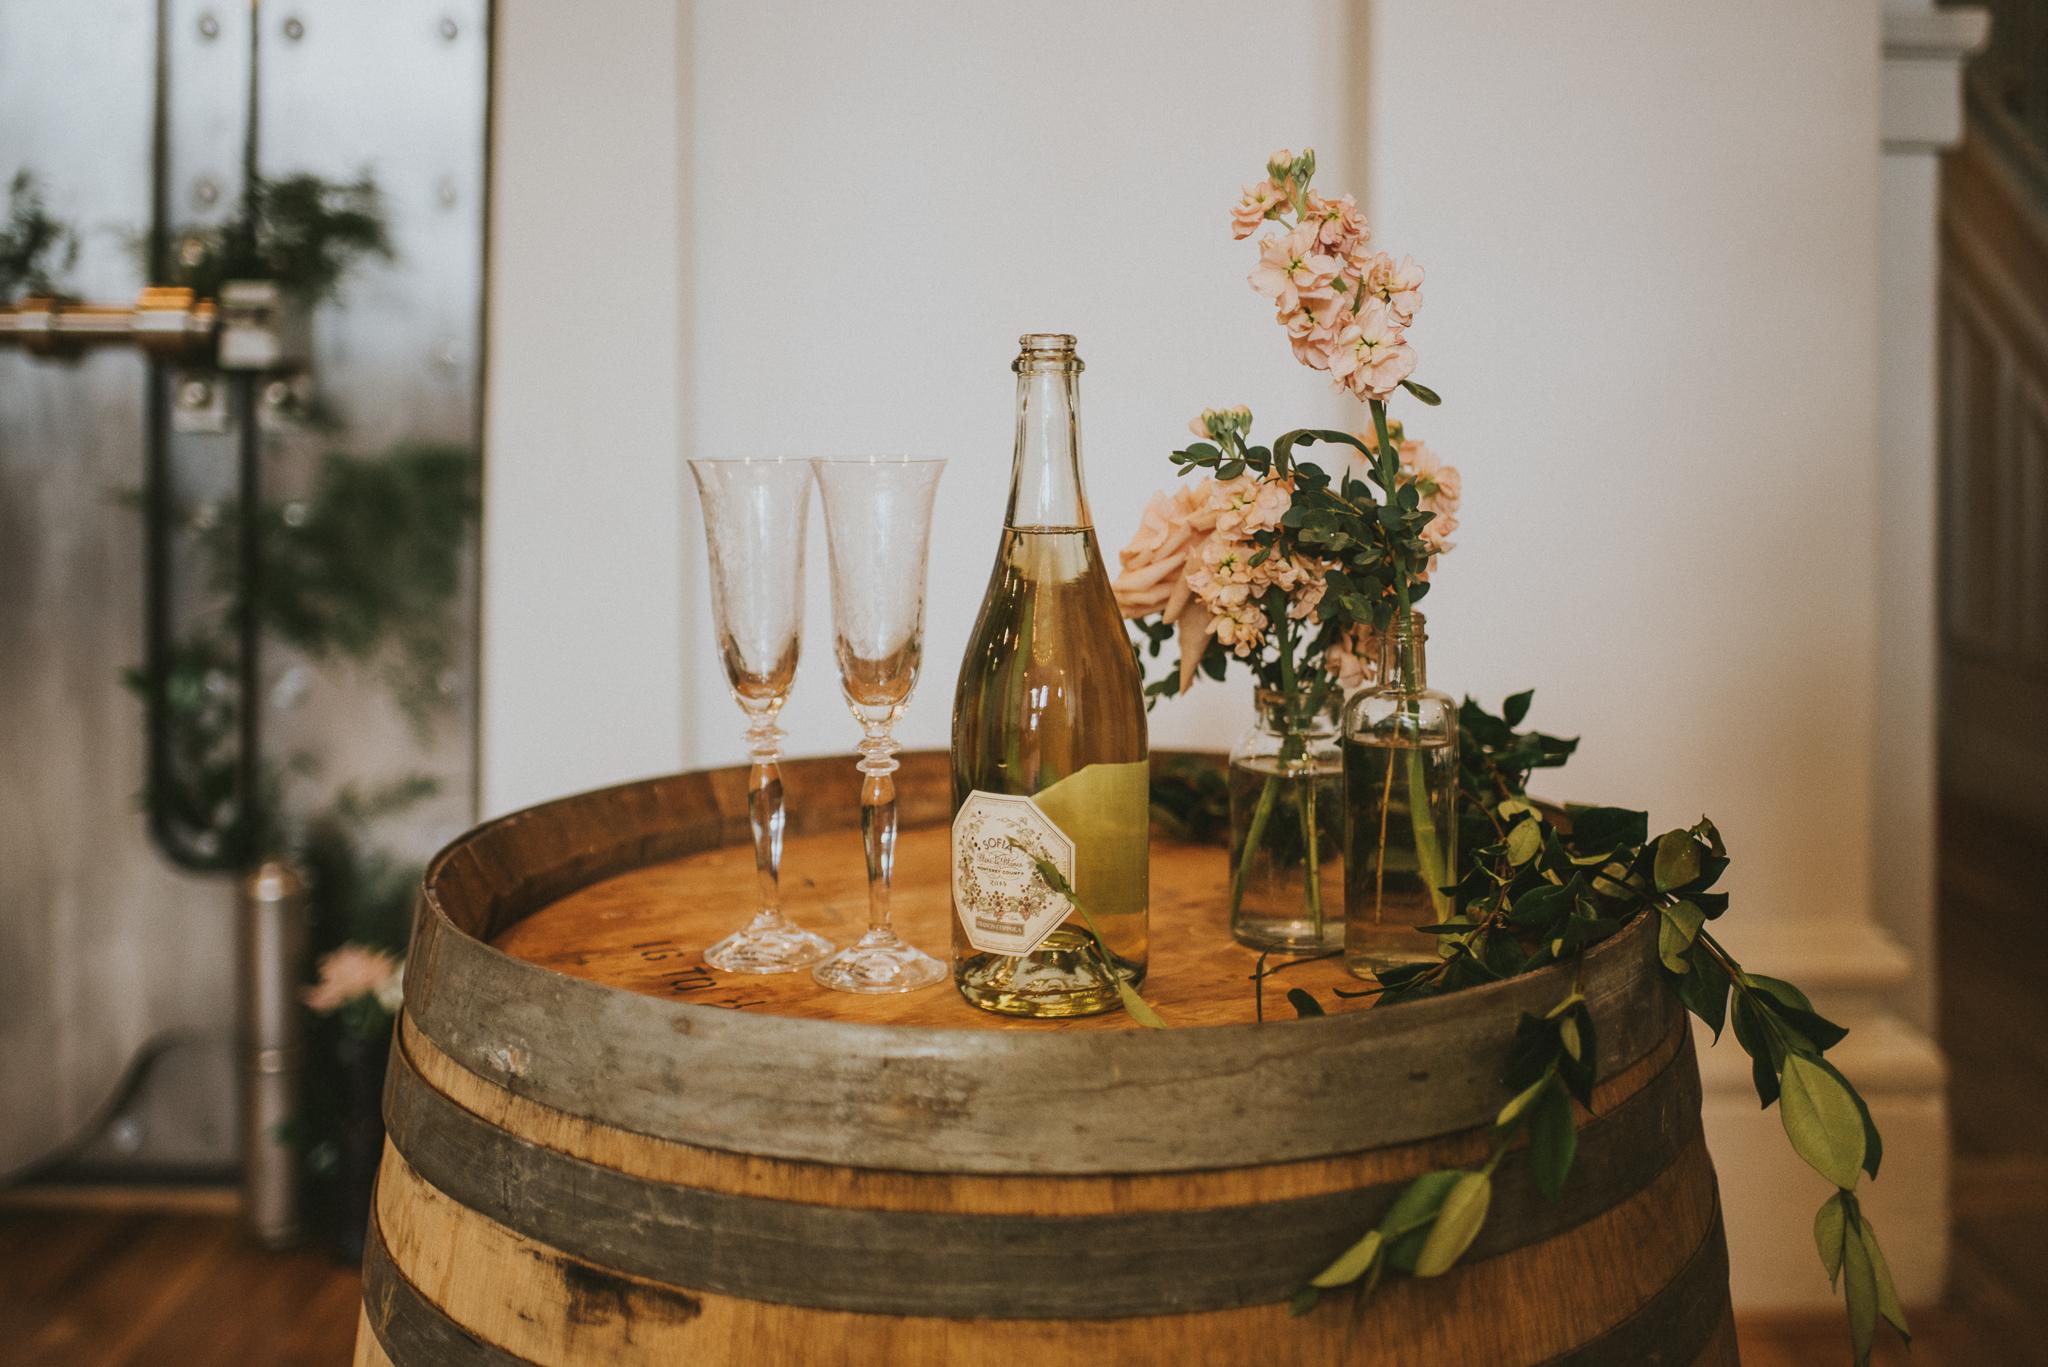 30-permanent-vancouver-wedding-courtneysteven-web-7635.jpg